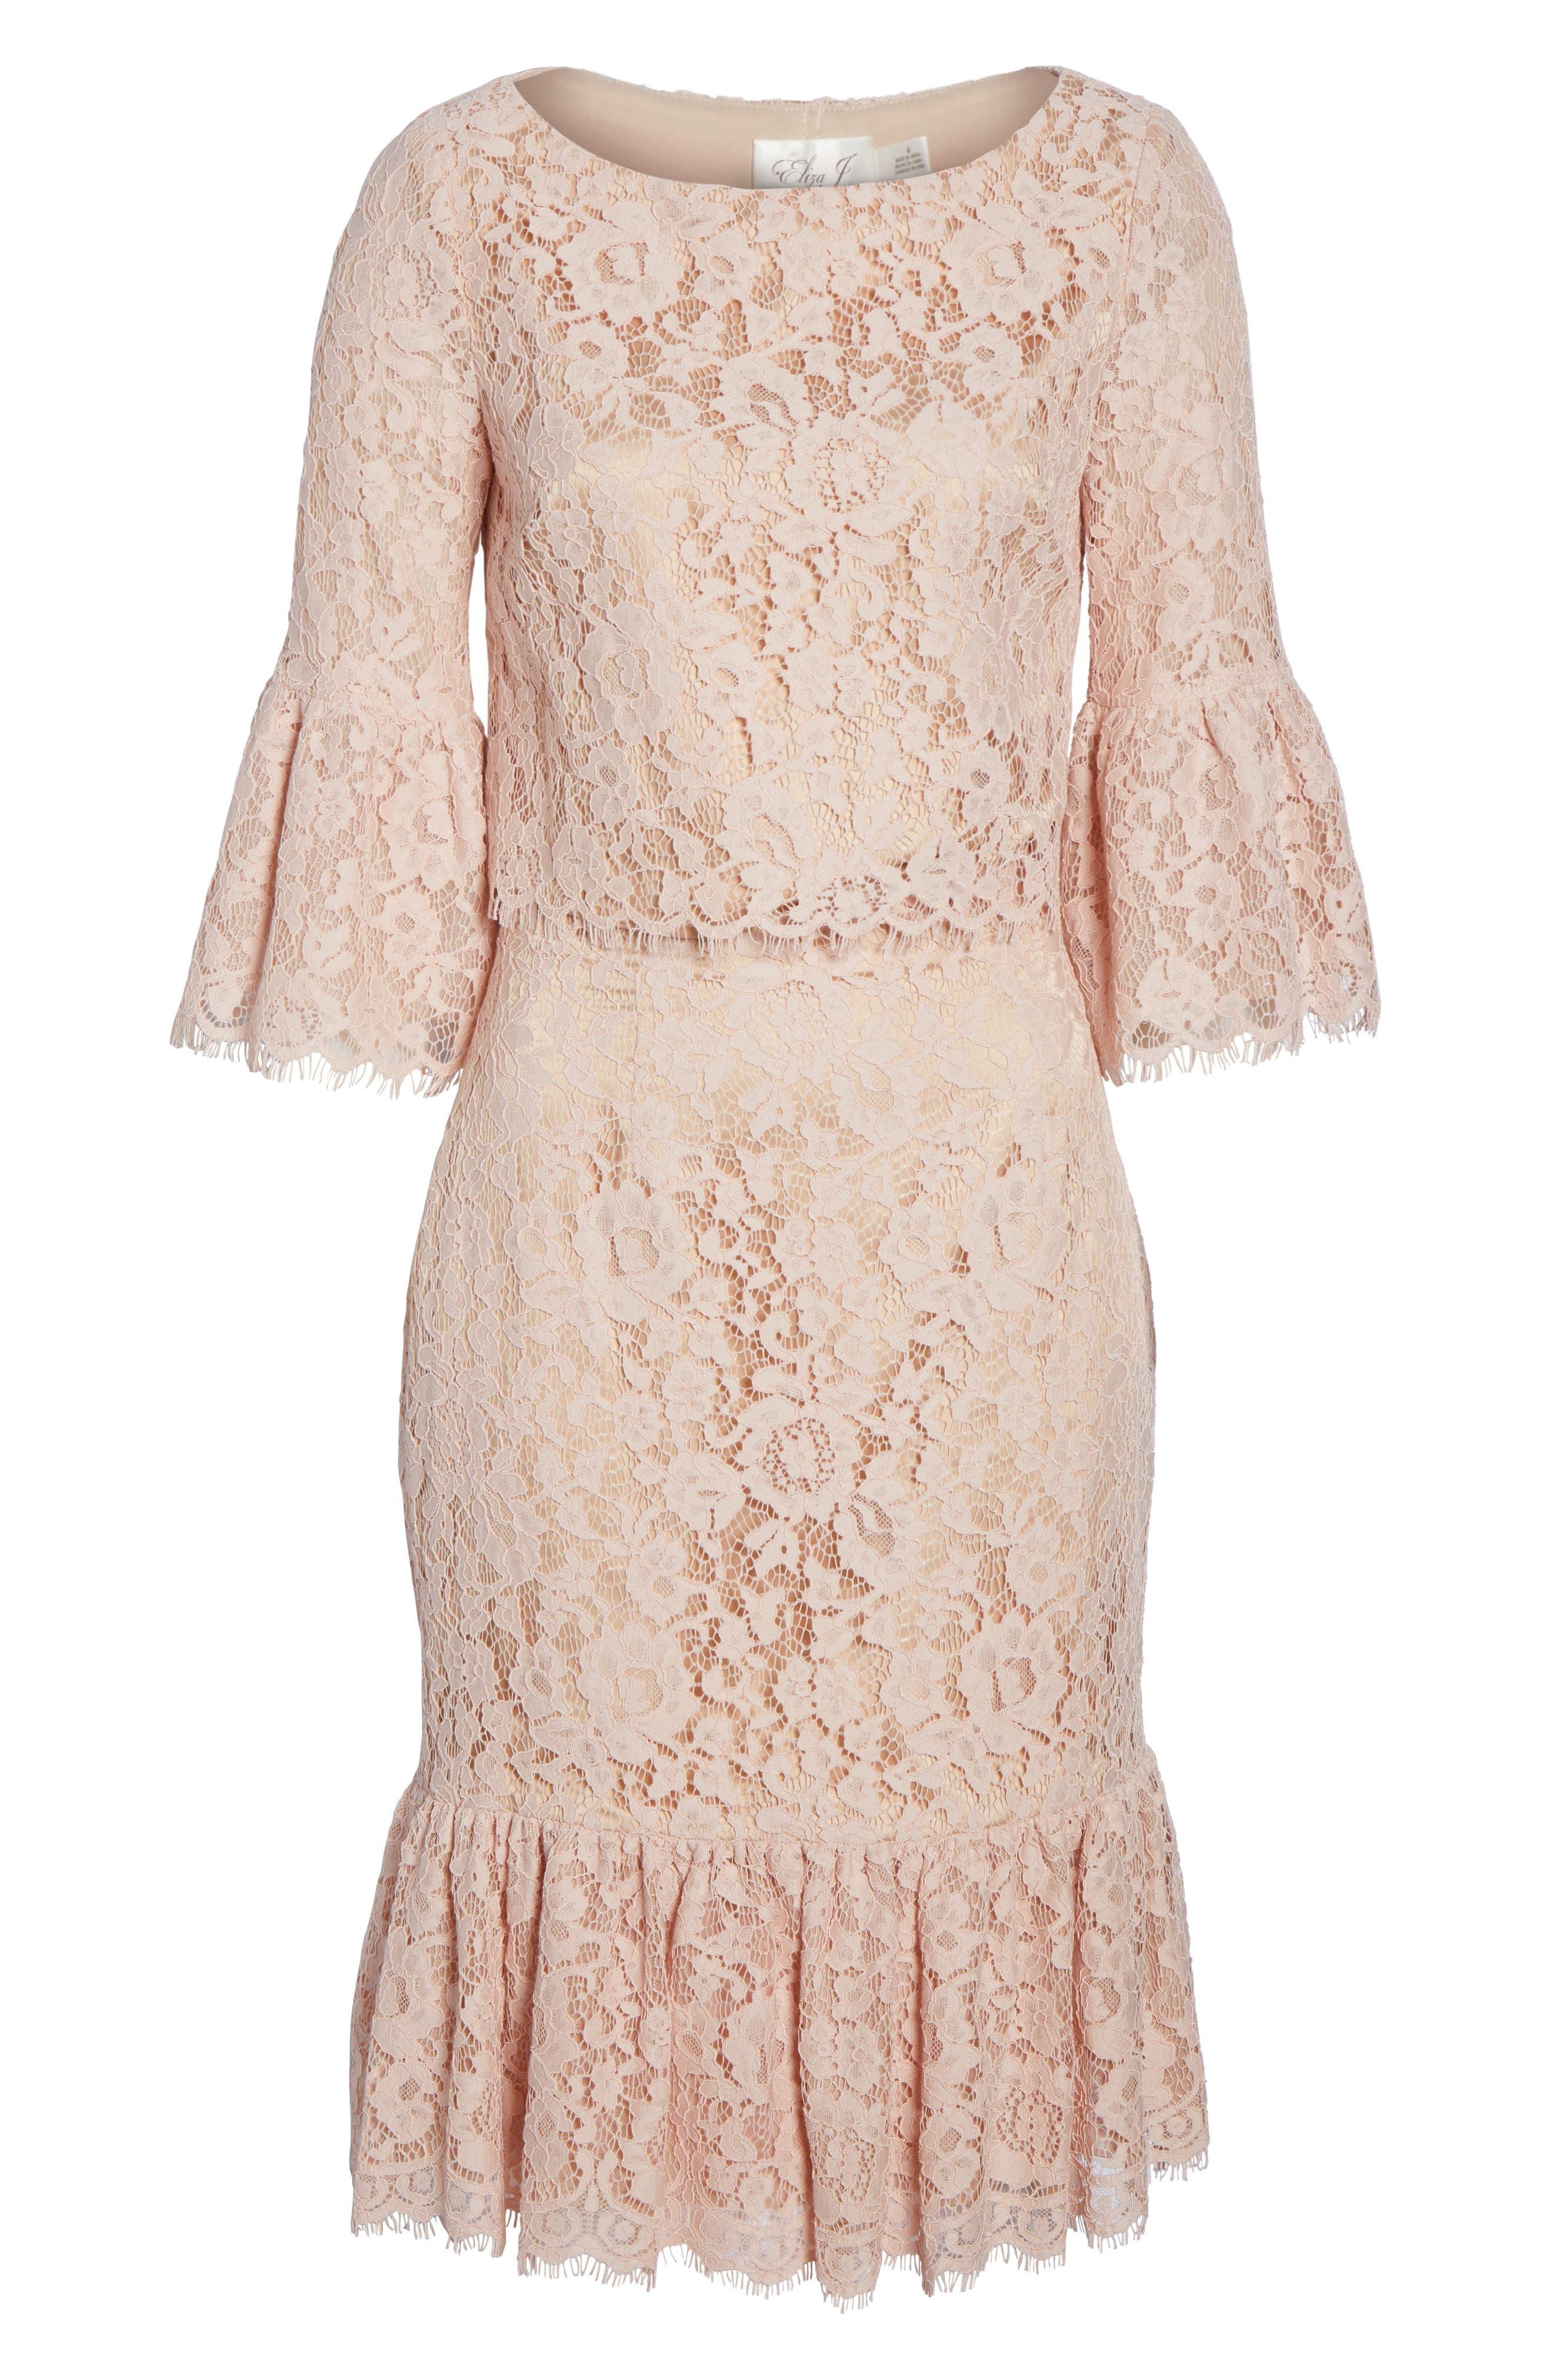 Ruffle Trim Lace Two-Piece Dress,                             Alternate thumbnail 6, color,                             651